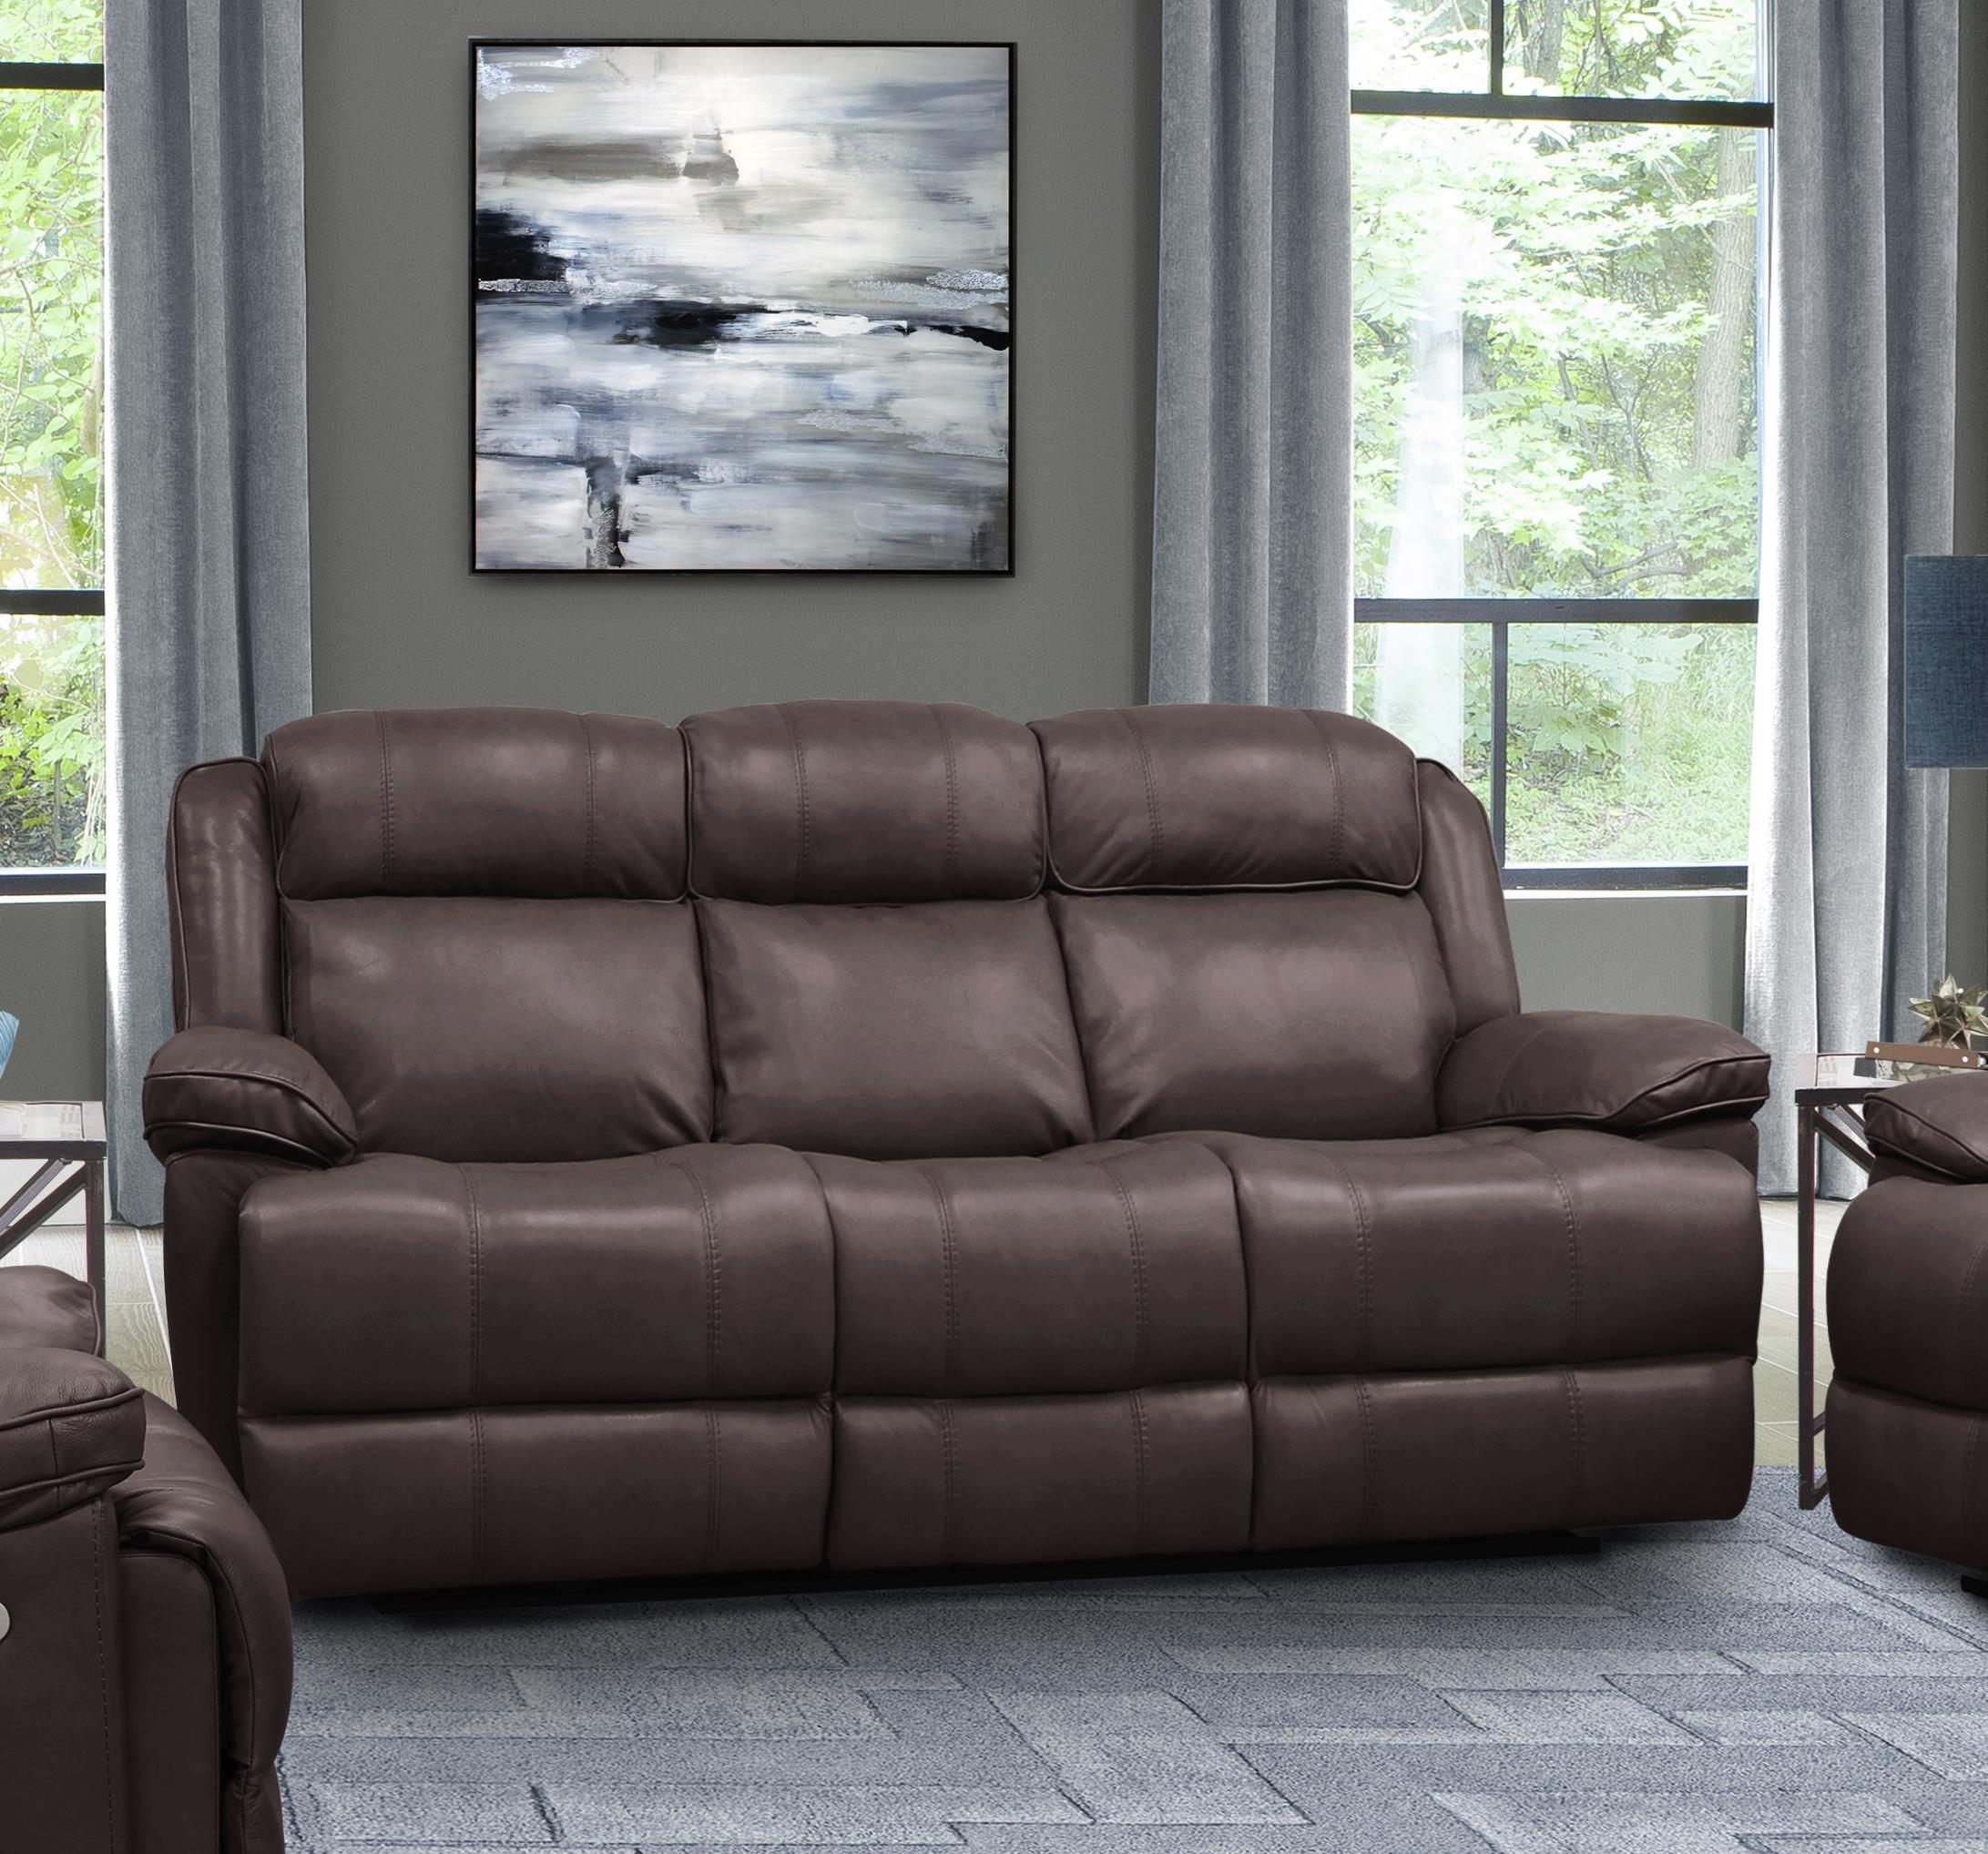 Elias Elias Top Grain Leather Match Power Sofa by Parker House at Morris Home